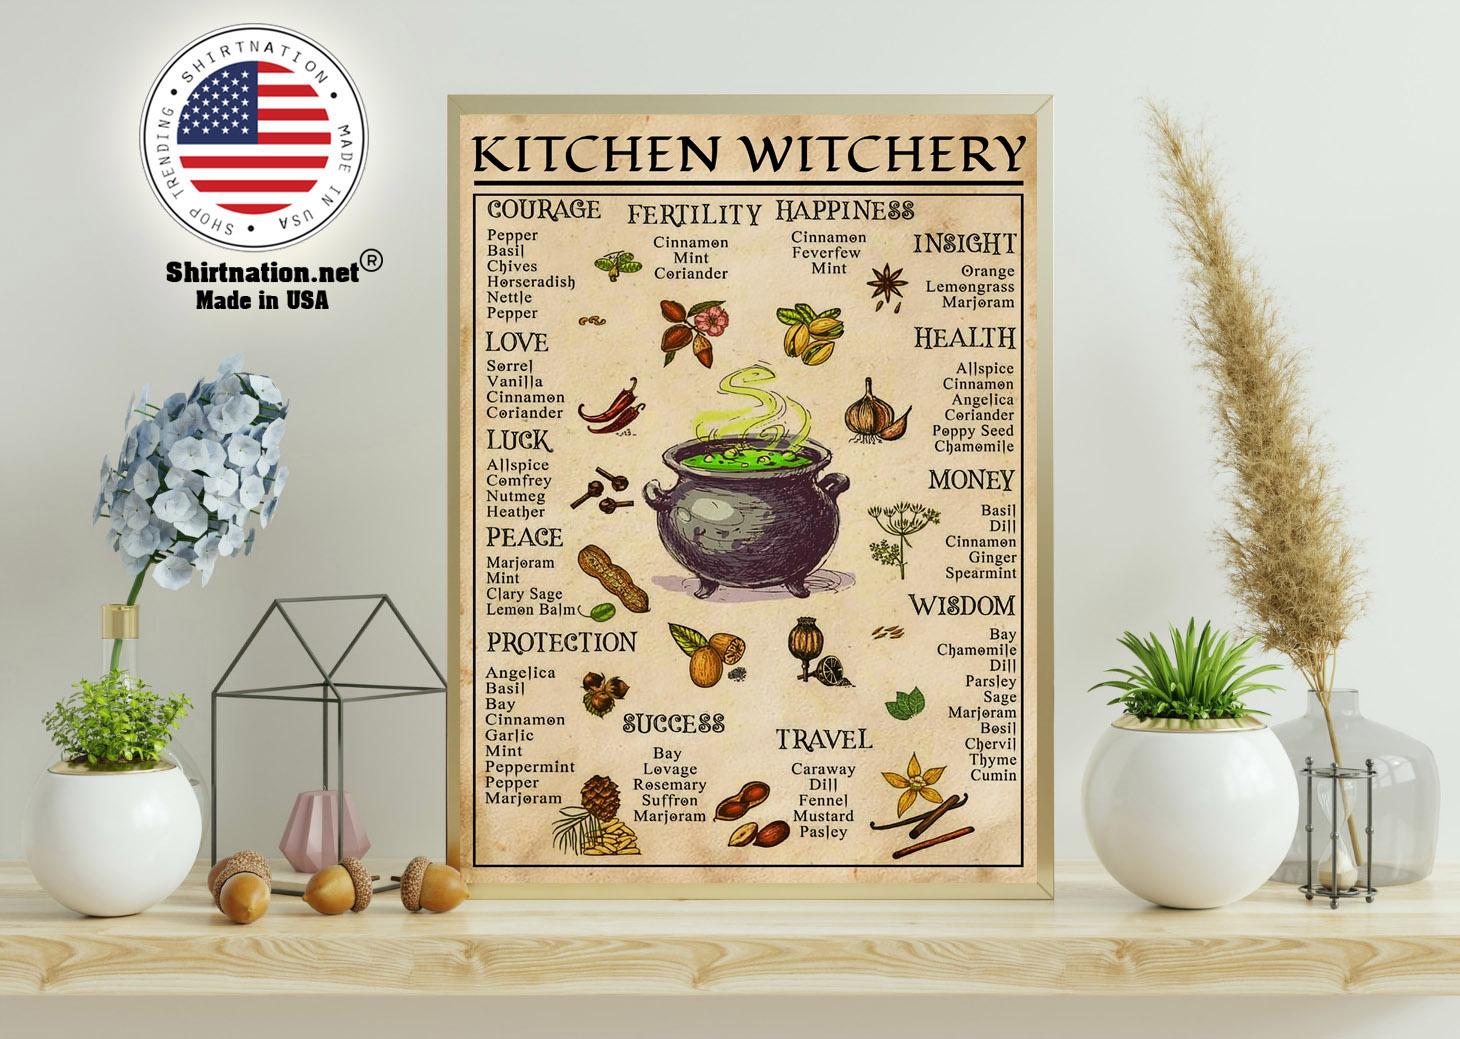 Kitchen witchery poster 11